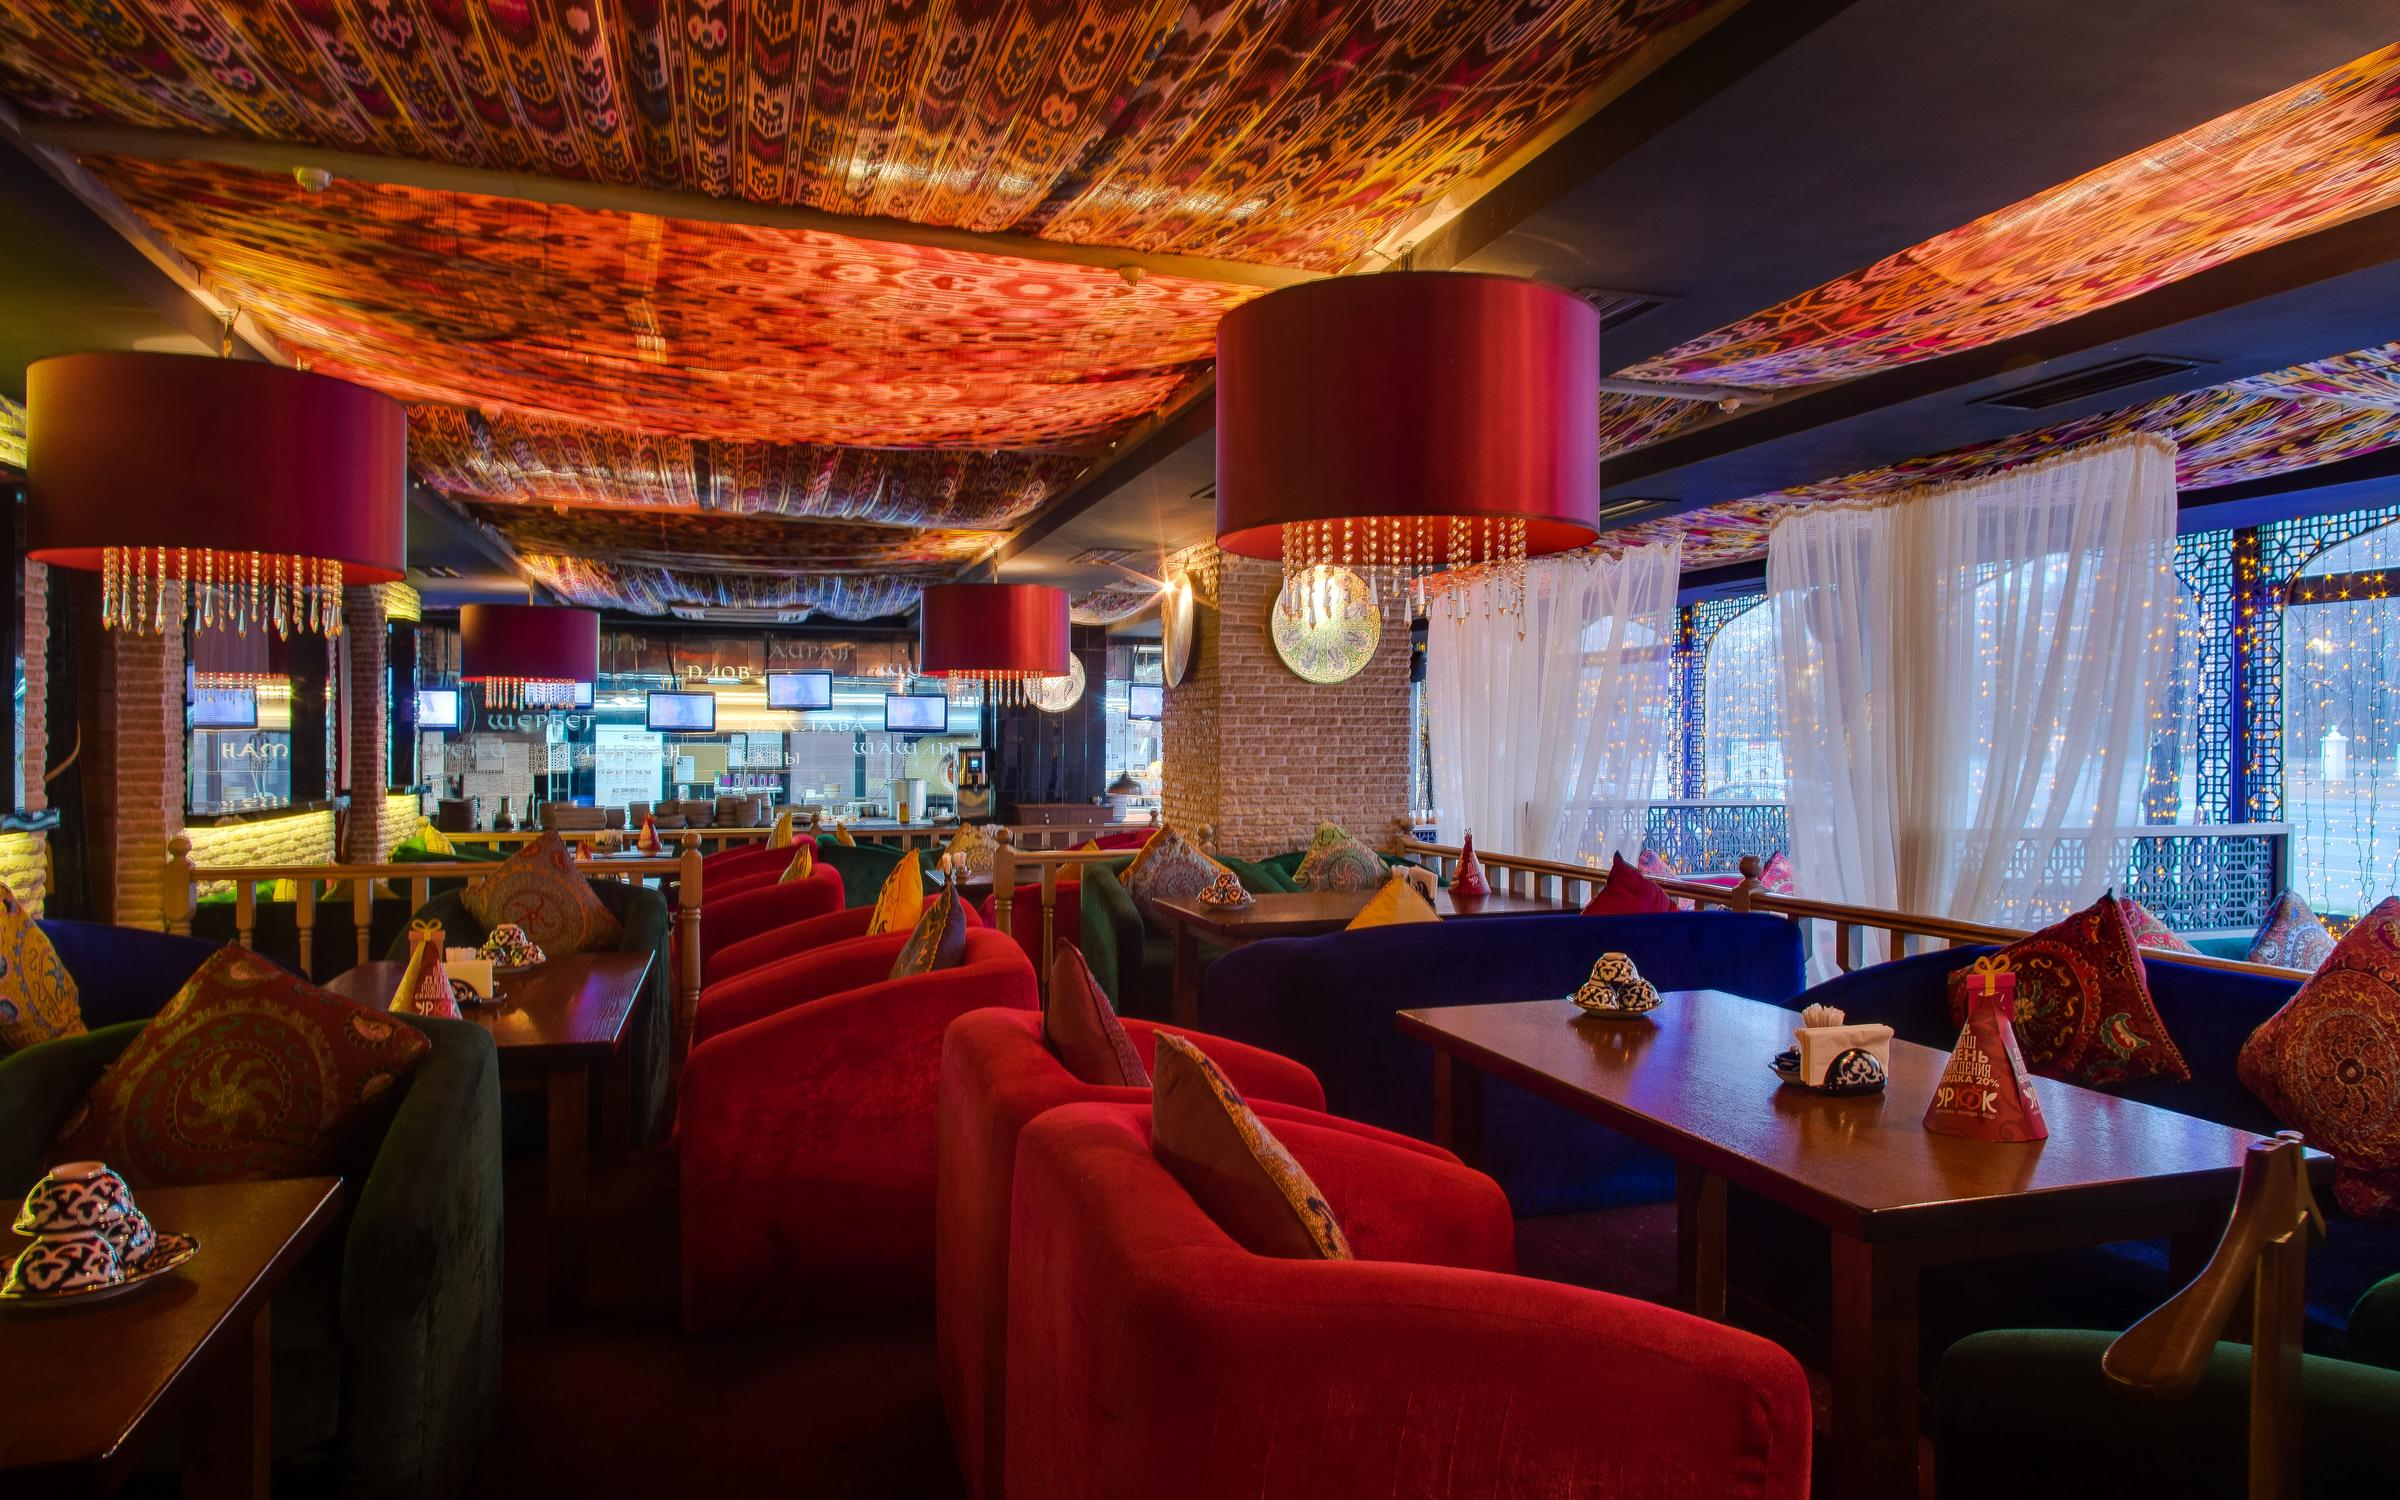 фотография Ресторана Урюк на Ленинском проспекте